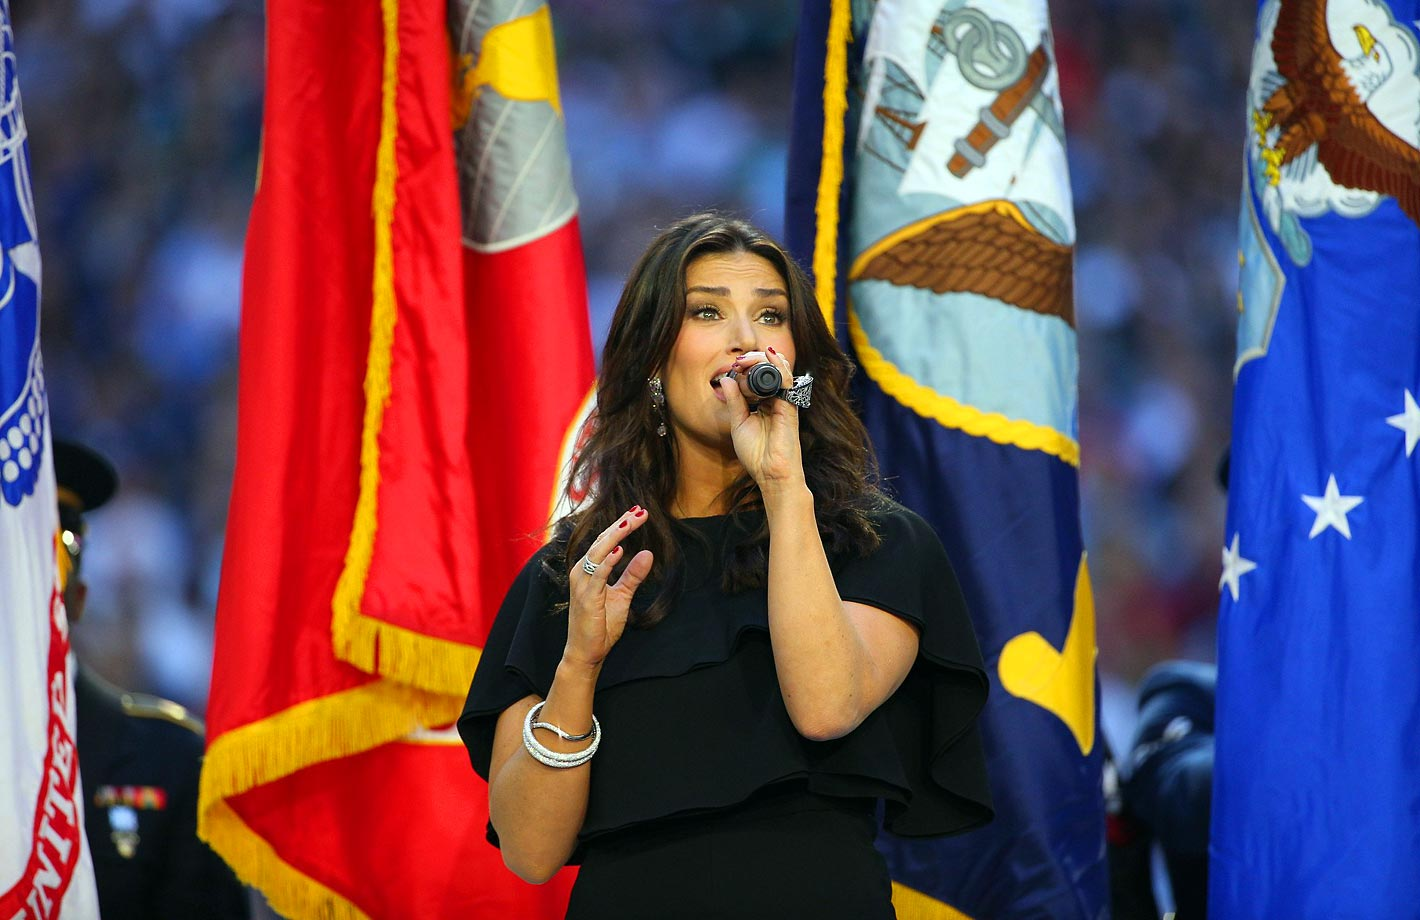 Singer Idina Menzel sings the national anthem prior to Super Bowl XLIX.